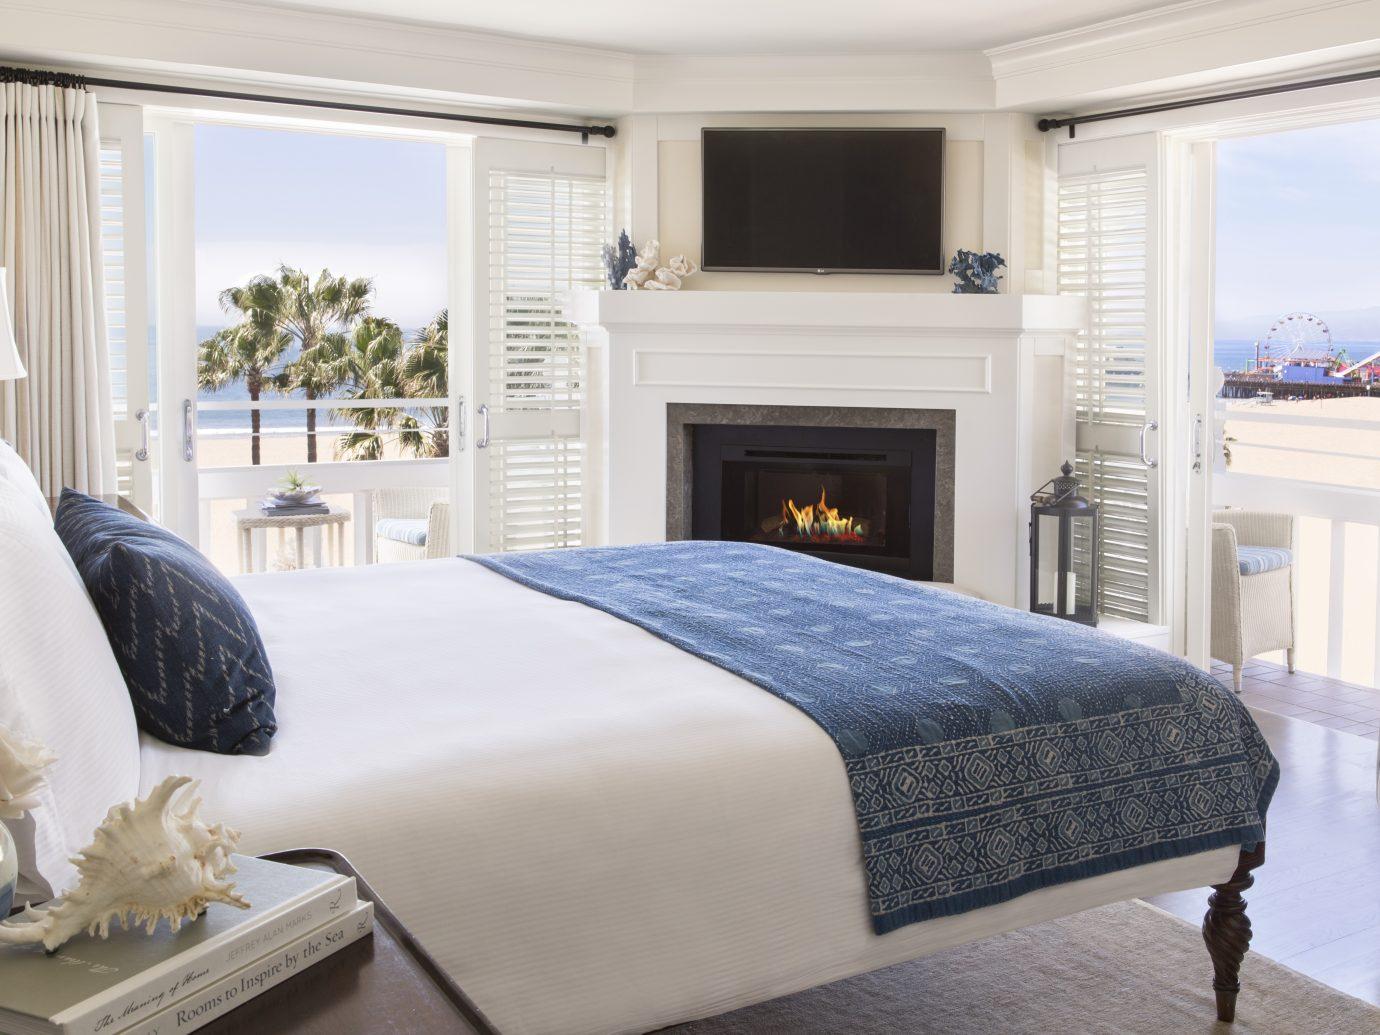 Ocean view guestroom at Shutters on the Beach, Santa Monica, CA